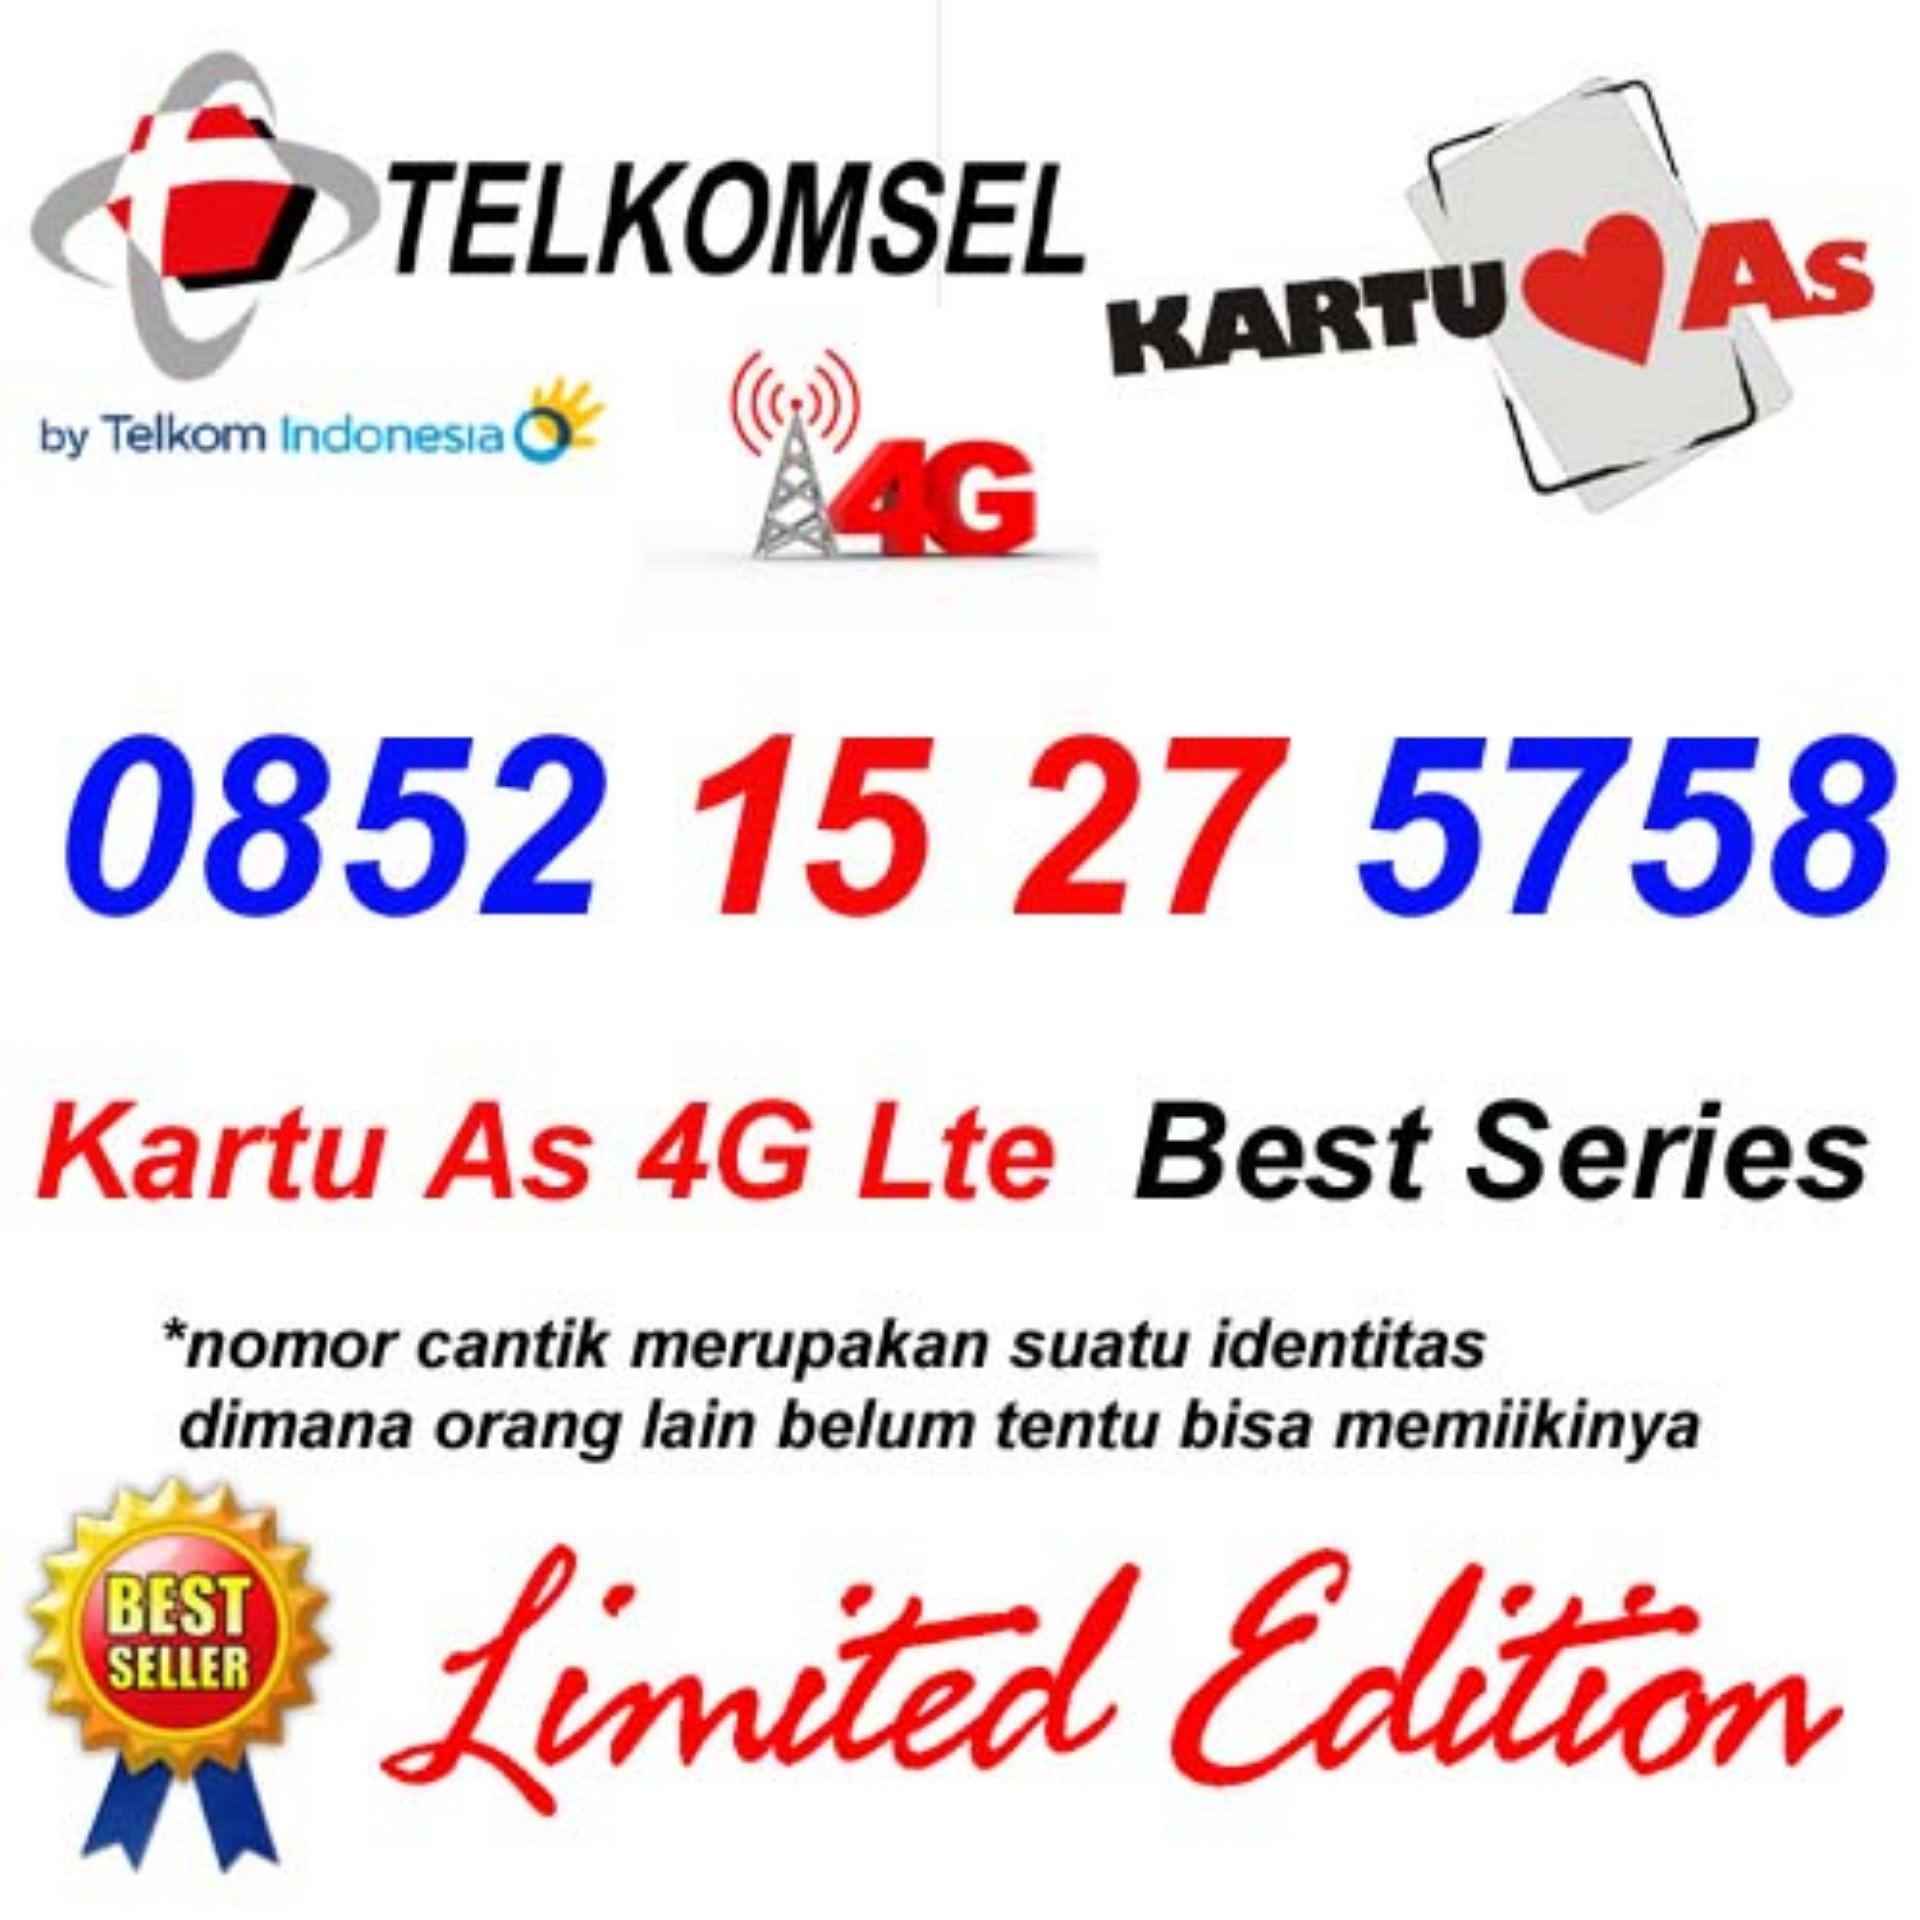 Telkomsel As 4G Lte 0852 15 27 5758 Kartu Perdana Nomor Cantik Maju Mapan